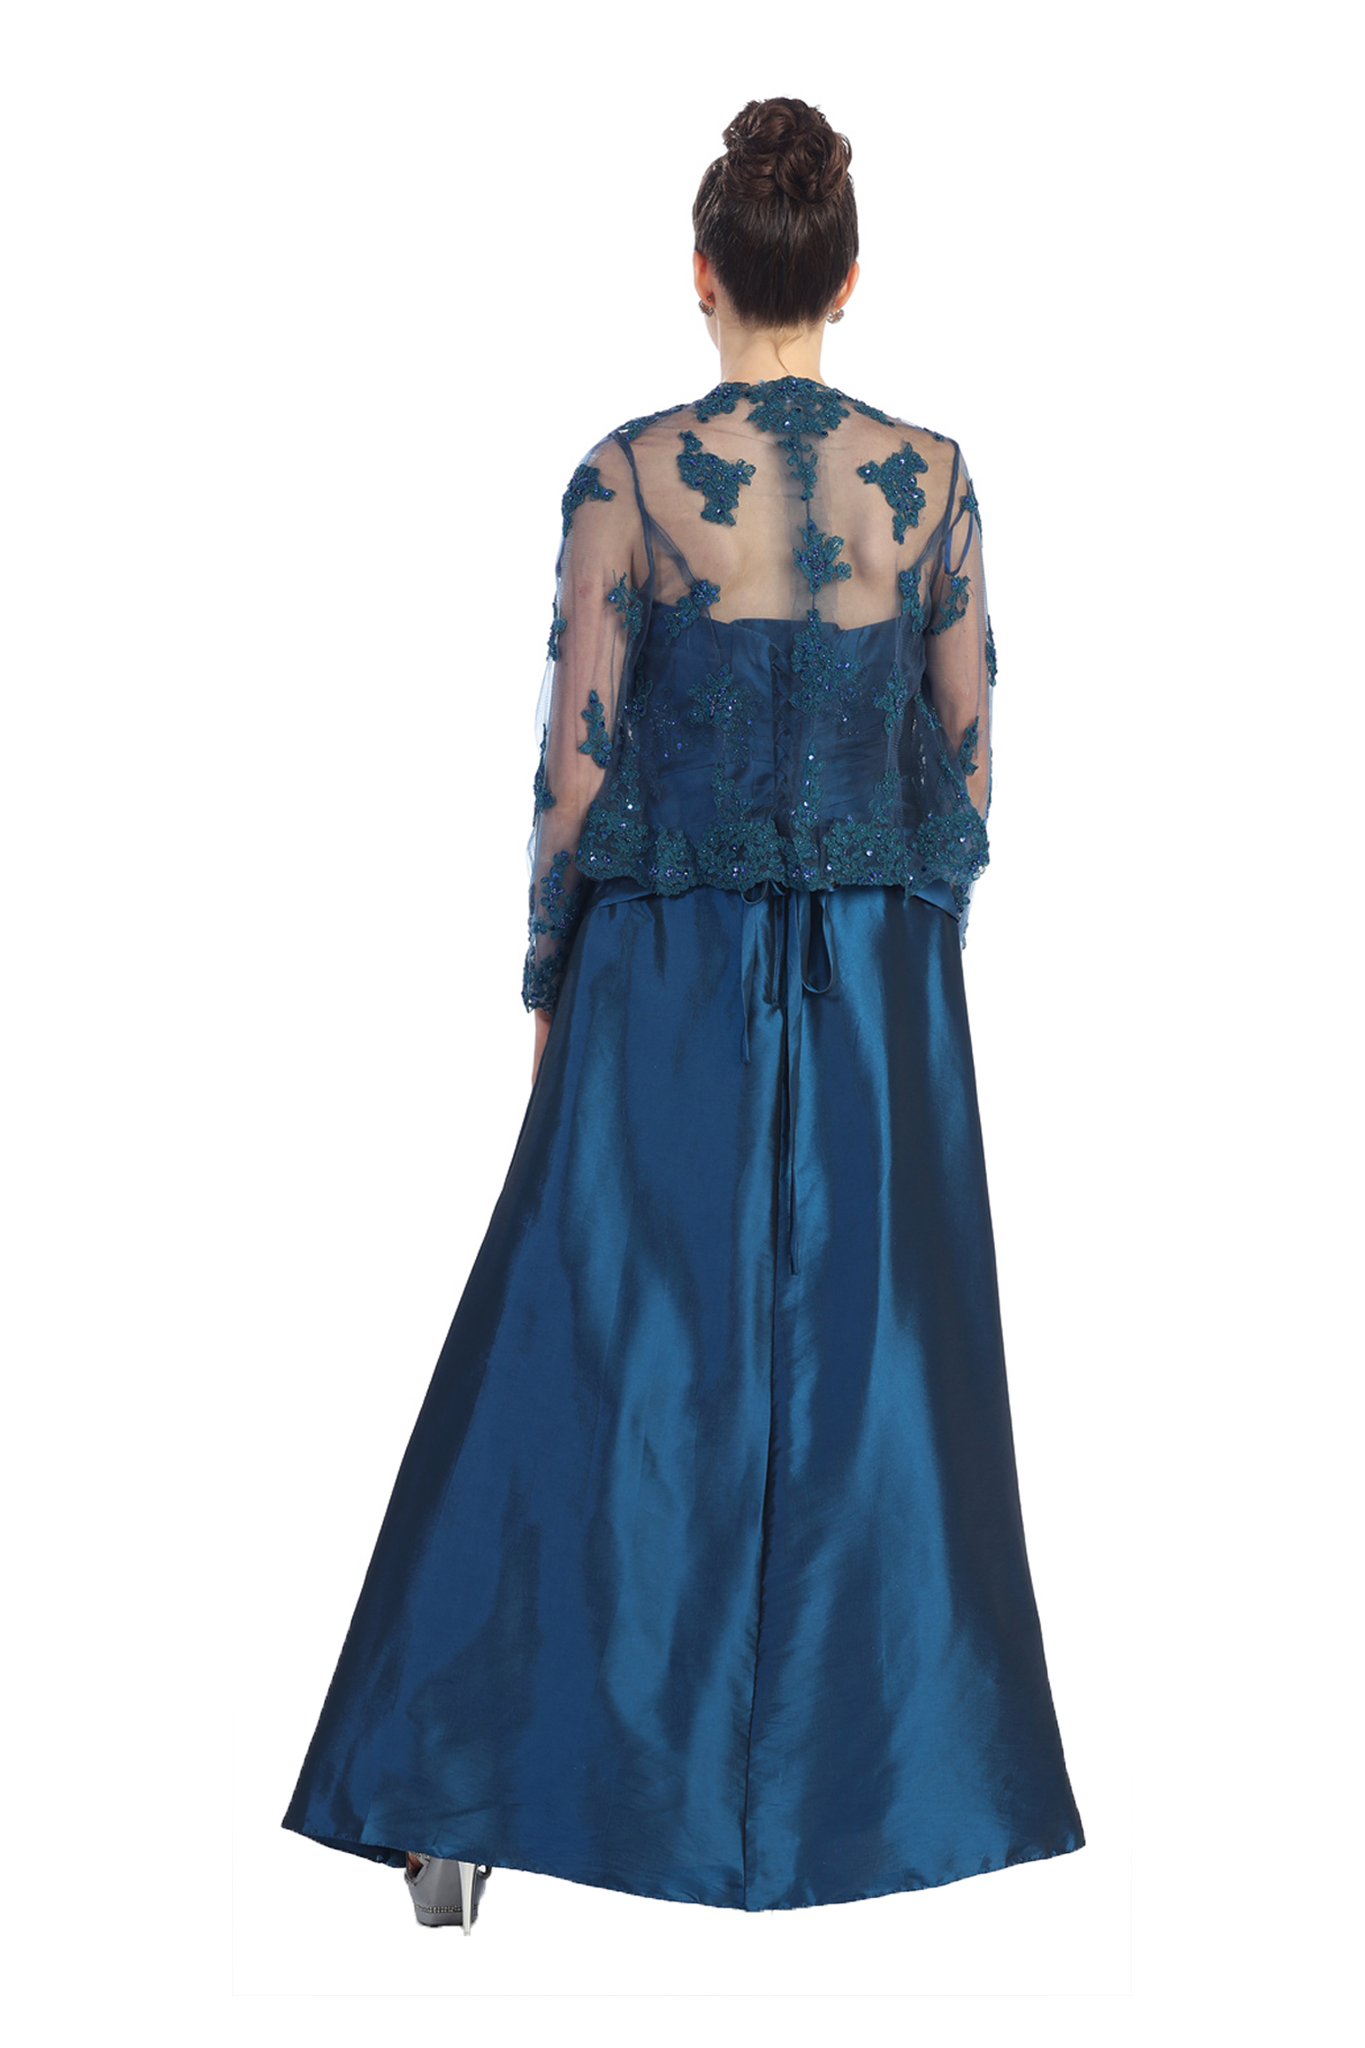 Mother of bride dresses plus size church reception wedding for Plus size dress for wedding reception